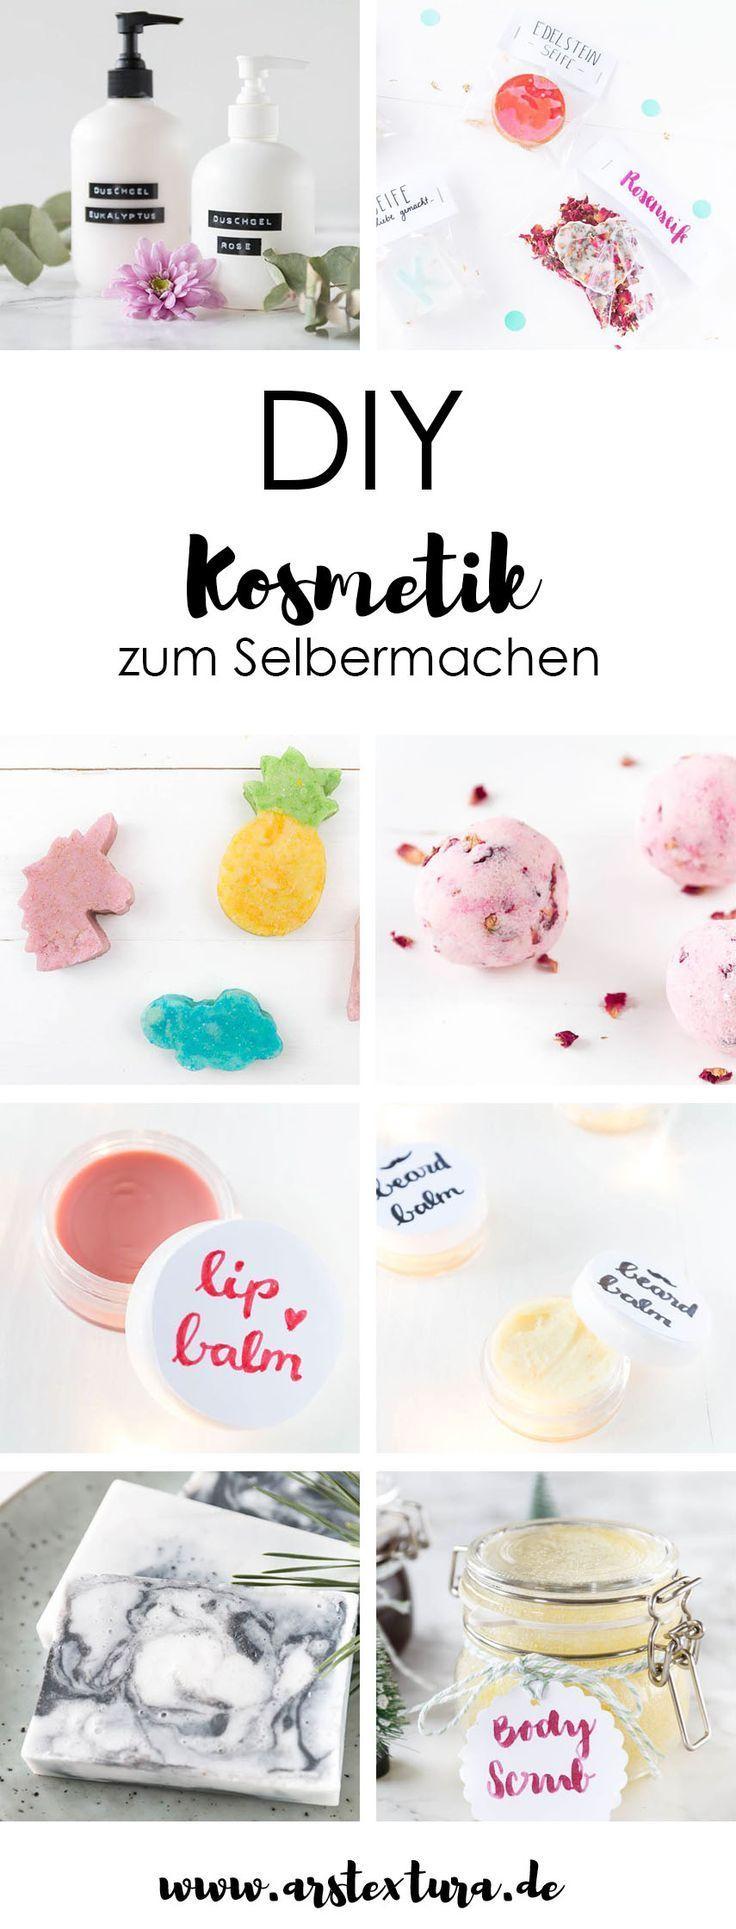 DIY-Kosmetik zum Selbermachen: DIY-Badebomben, DIY-Körperpeeling, …   – DIY – Geschenke